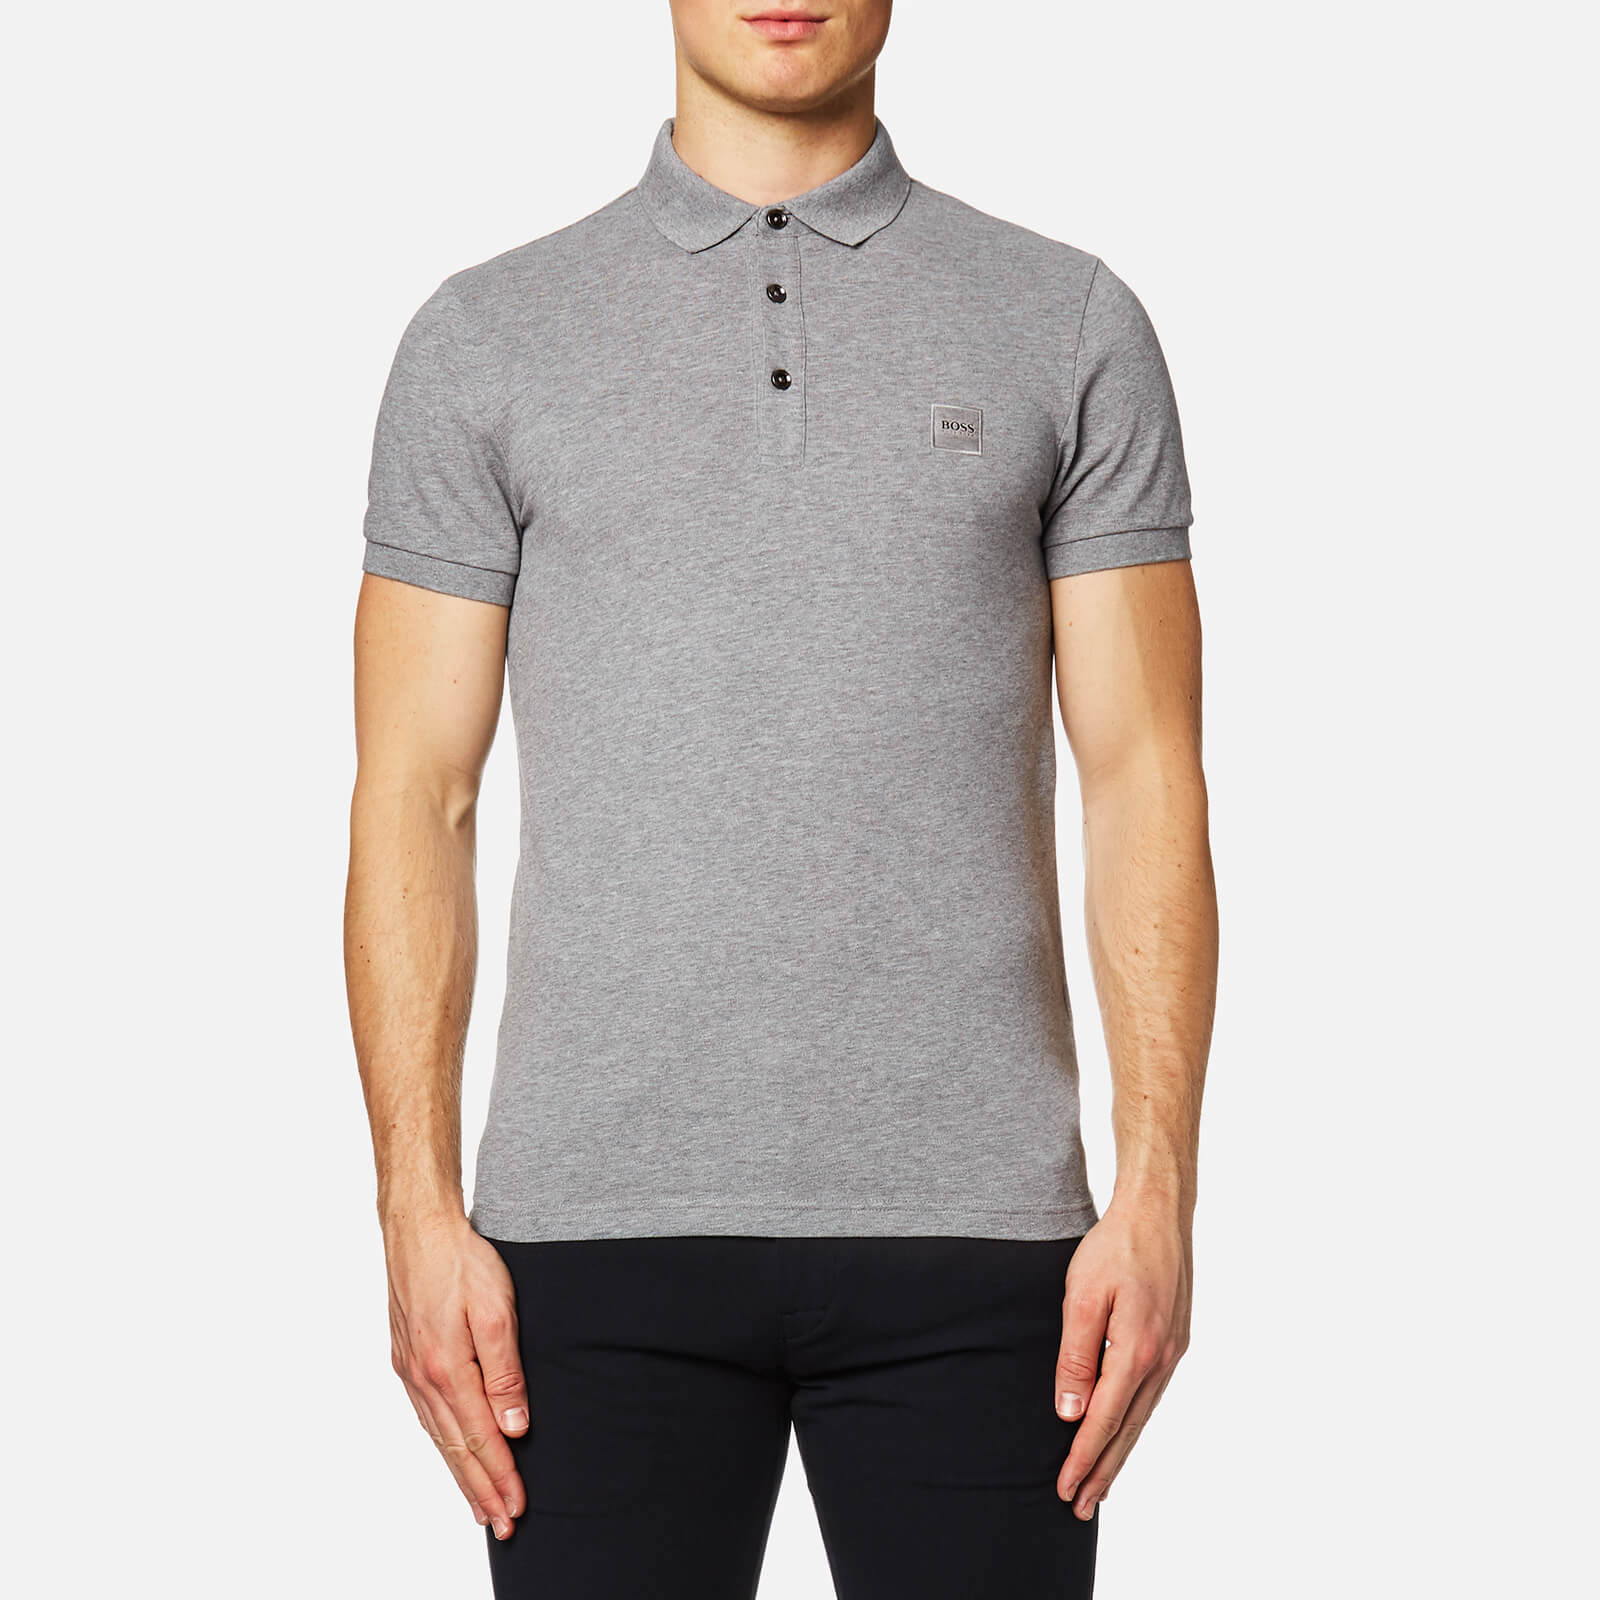 a9293205 BOSS Orange Men's Pavlik Short Sleeve Polo Shirt - Grey - Free UK Delivery  over £50